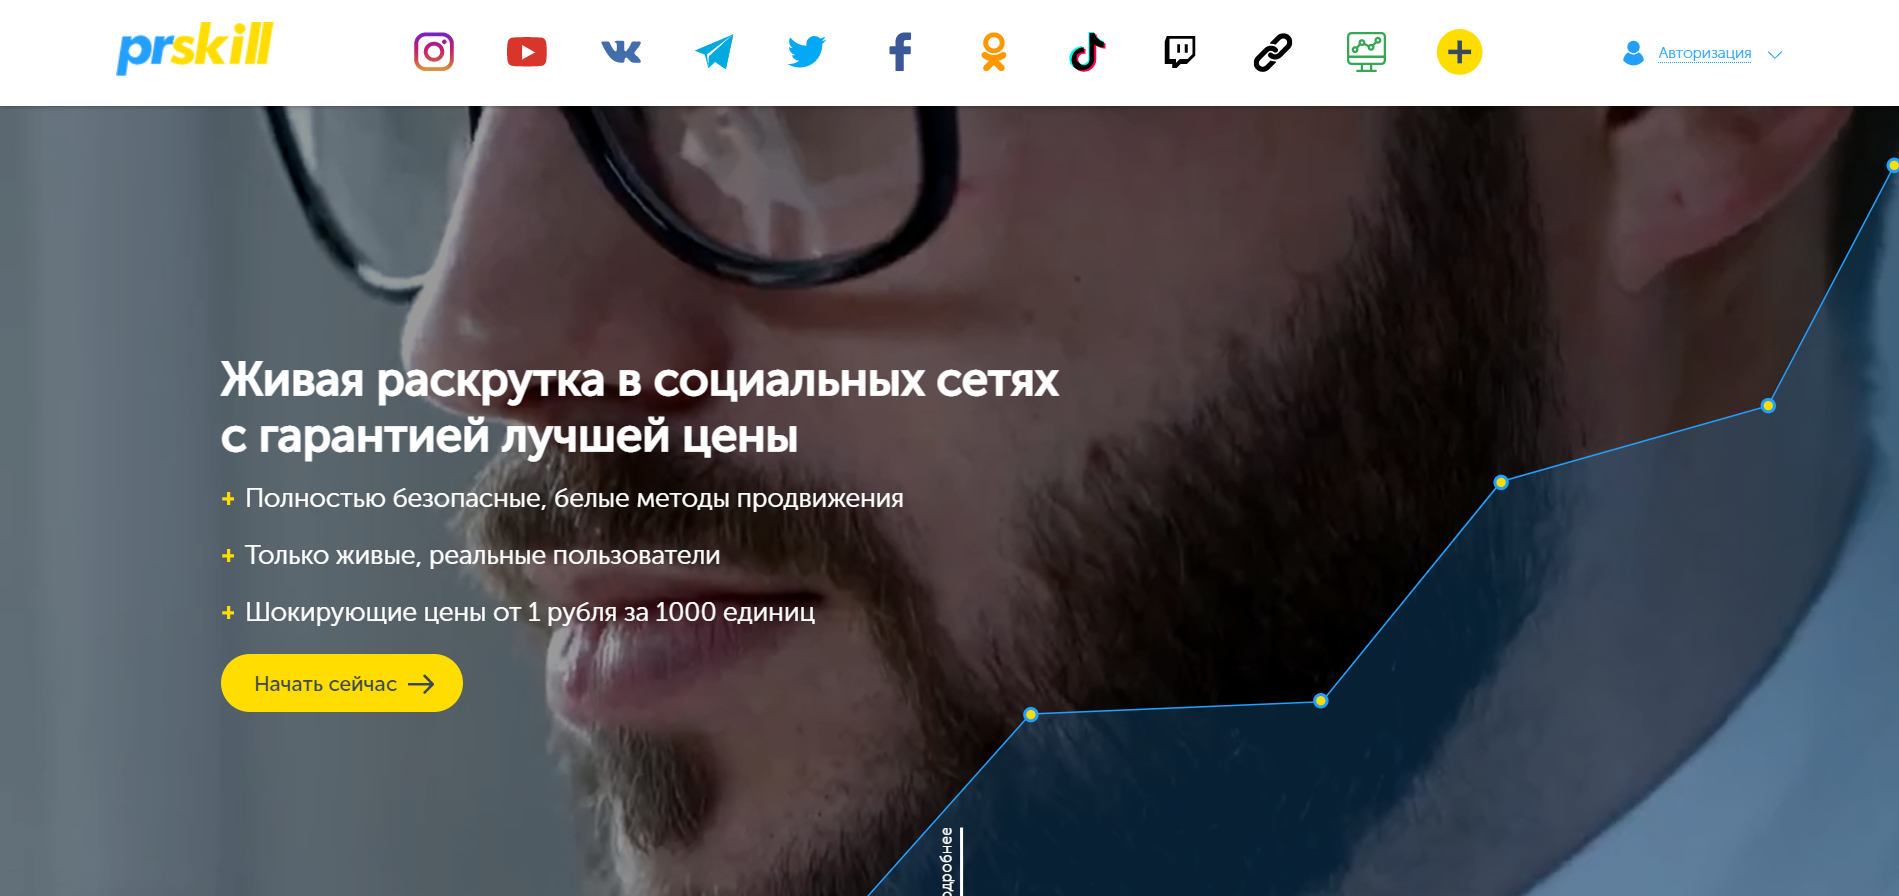 PrSkill сервис для накрутки подписчиков в инстаграме